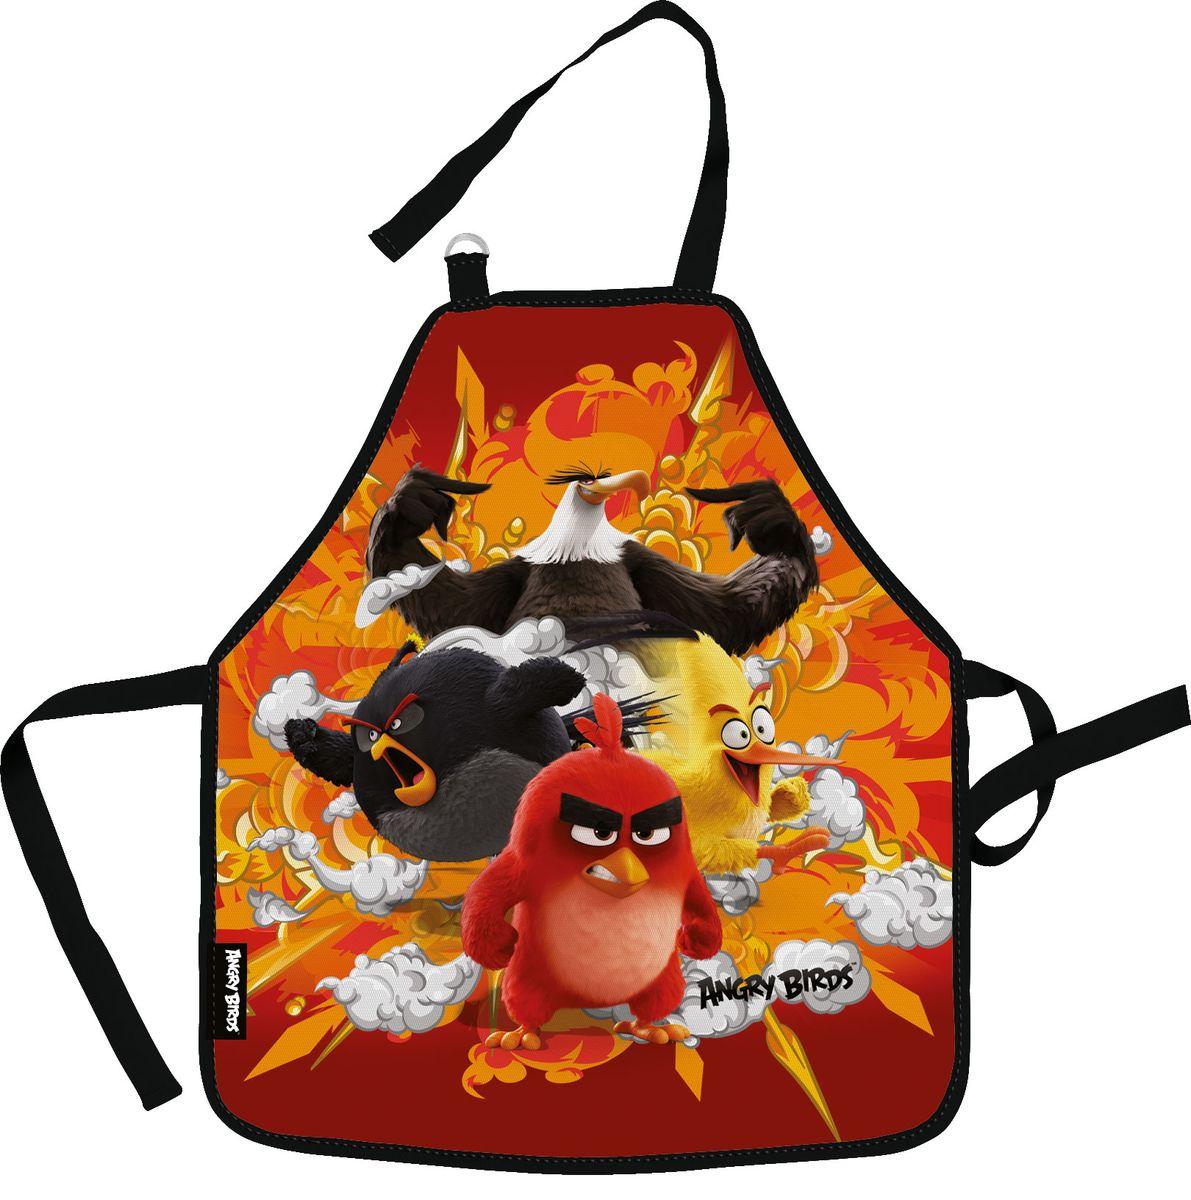 Angry Birds Movie Фартук для труда цвет красный оранжевый черный -  Аксессуары для труда